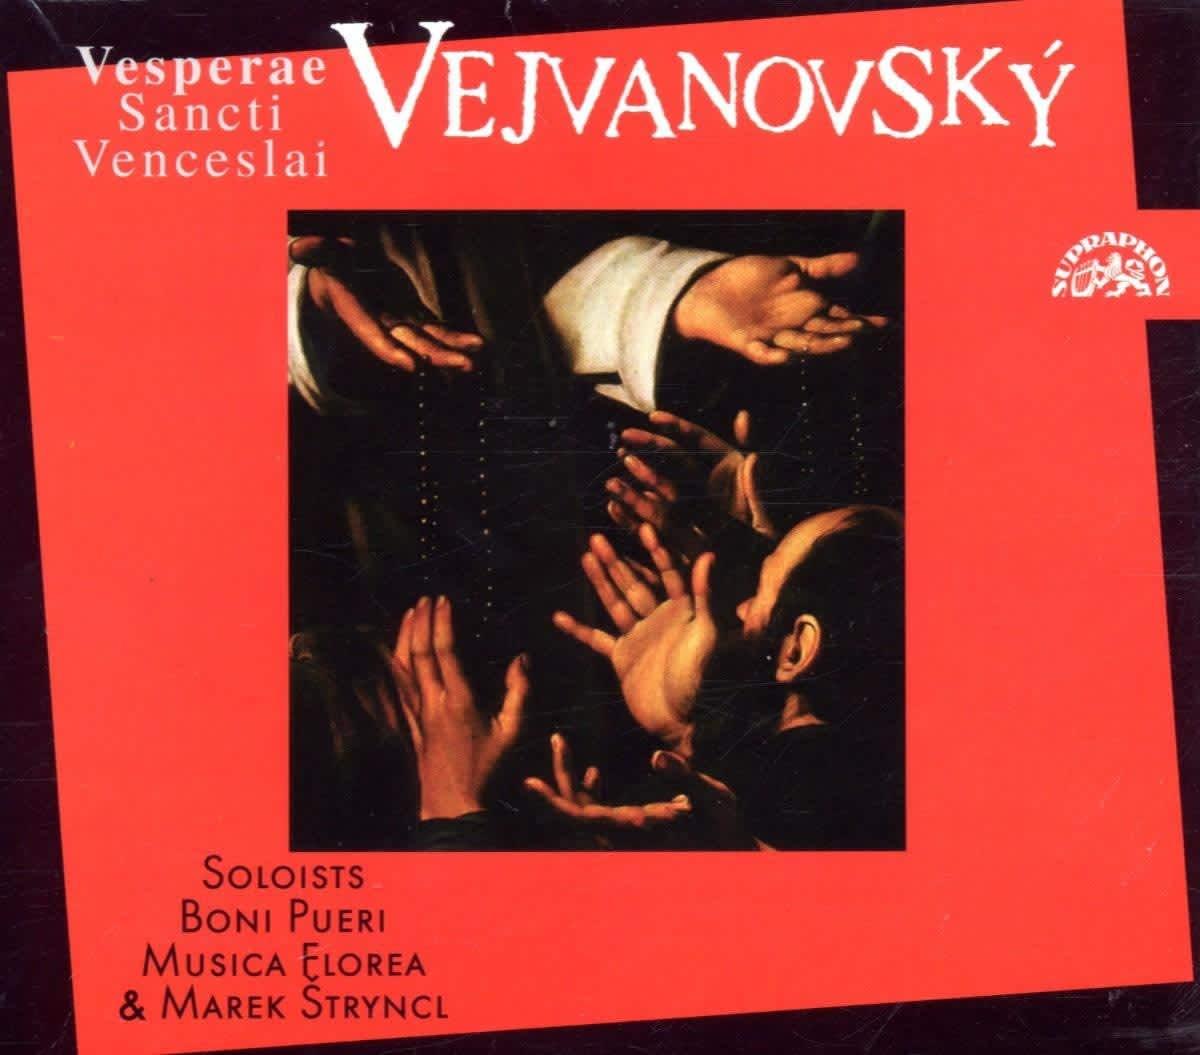 Photo No.1 of Pavel Josef Vejvanovsky: Vesperae Sancti Venceslai